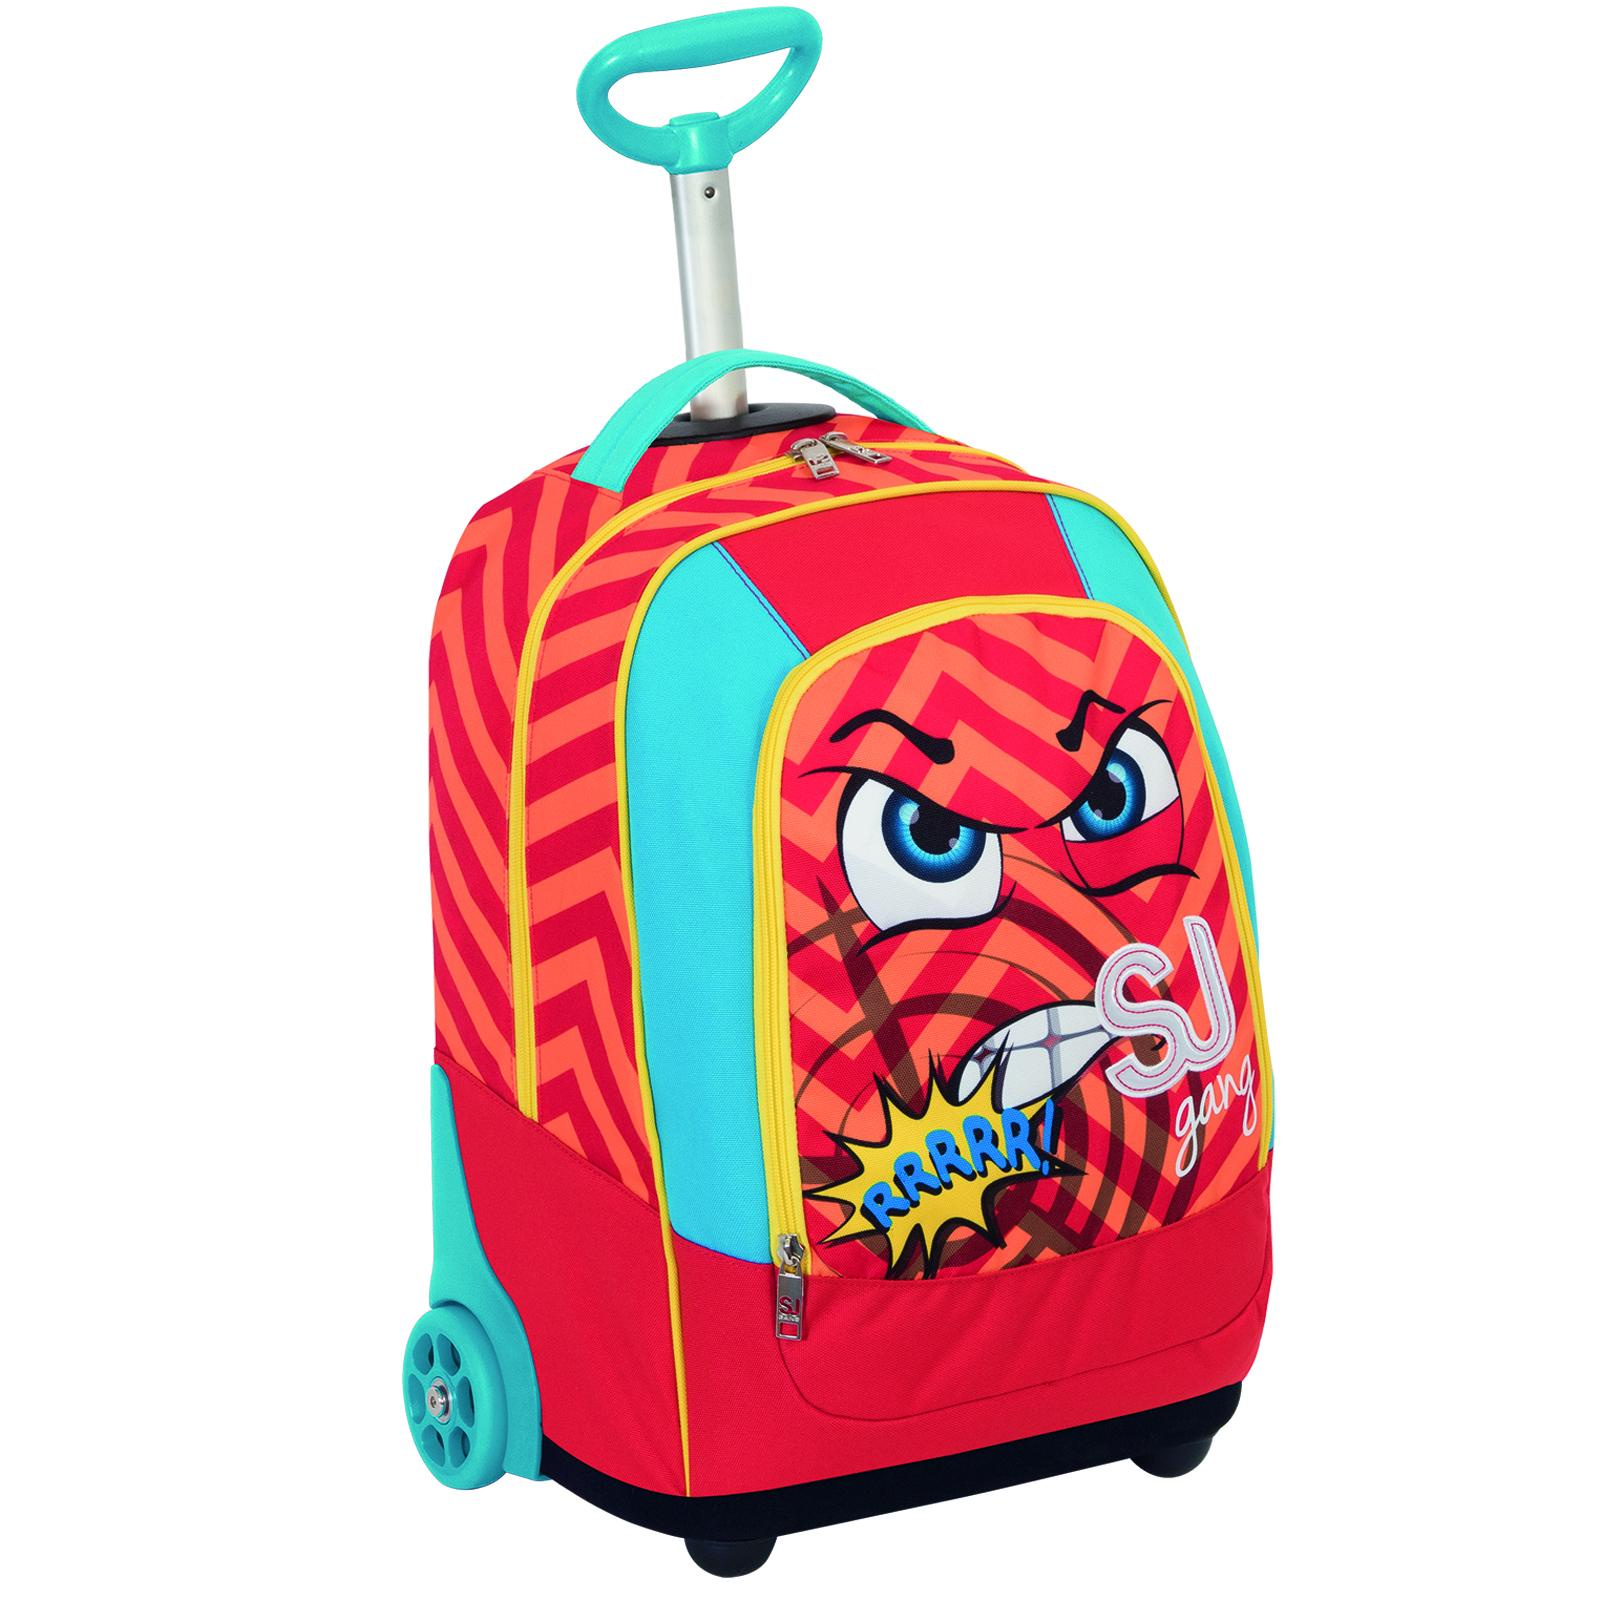 Рюкзак на колесиках BIG TROLLEY SJ GANG FACCE DA - Алое пламя